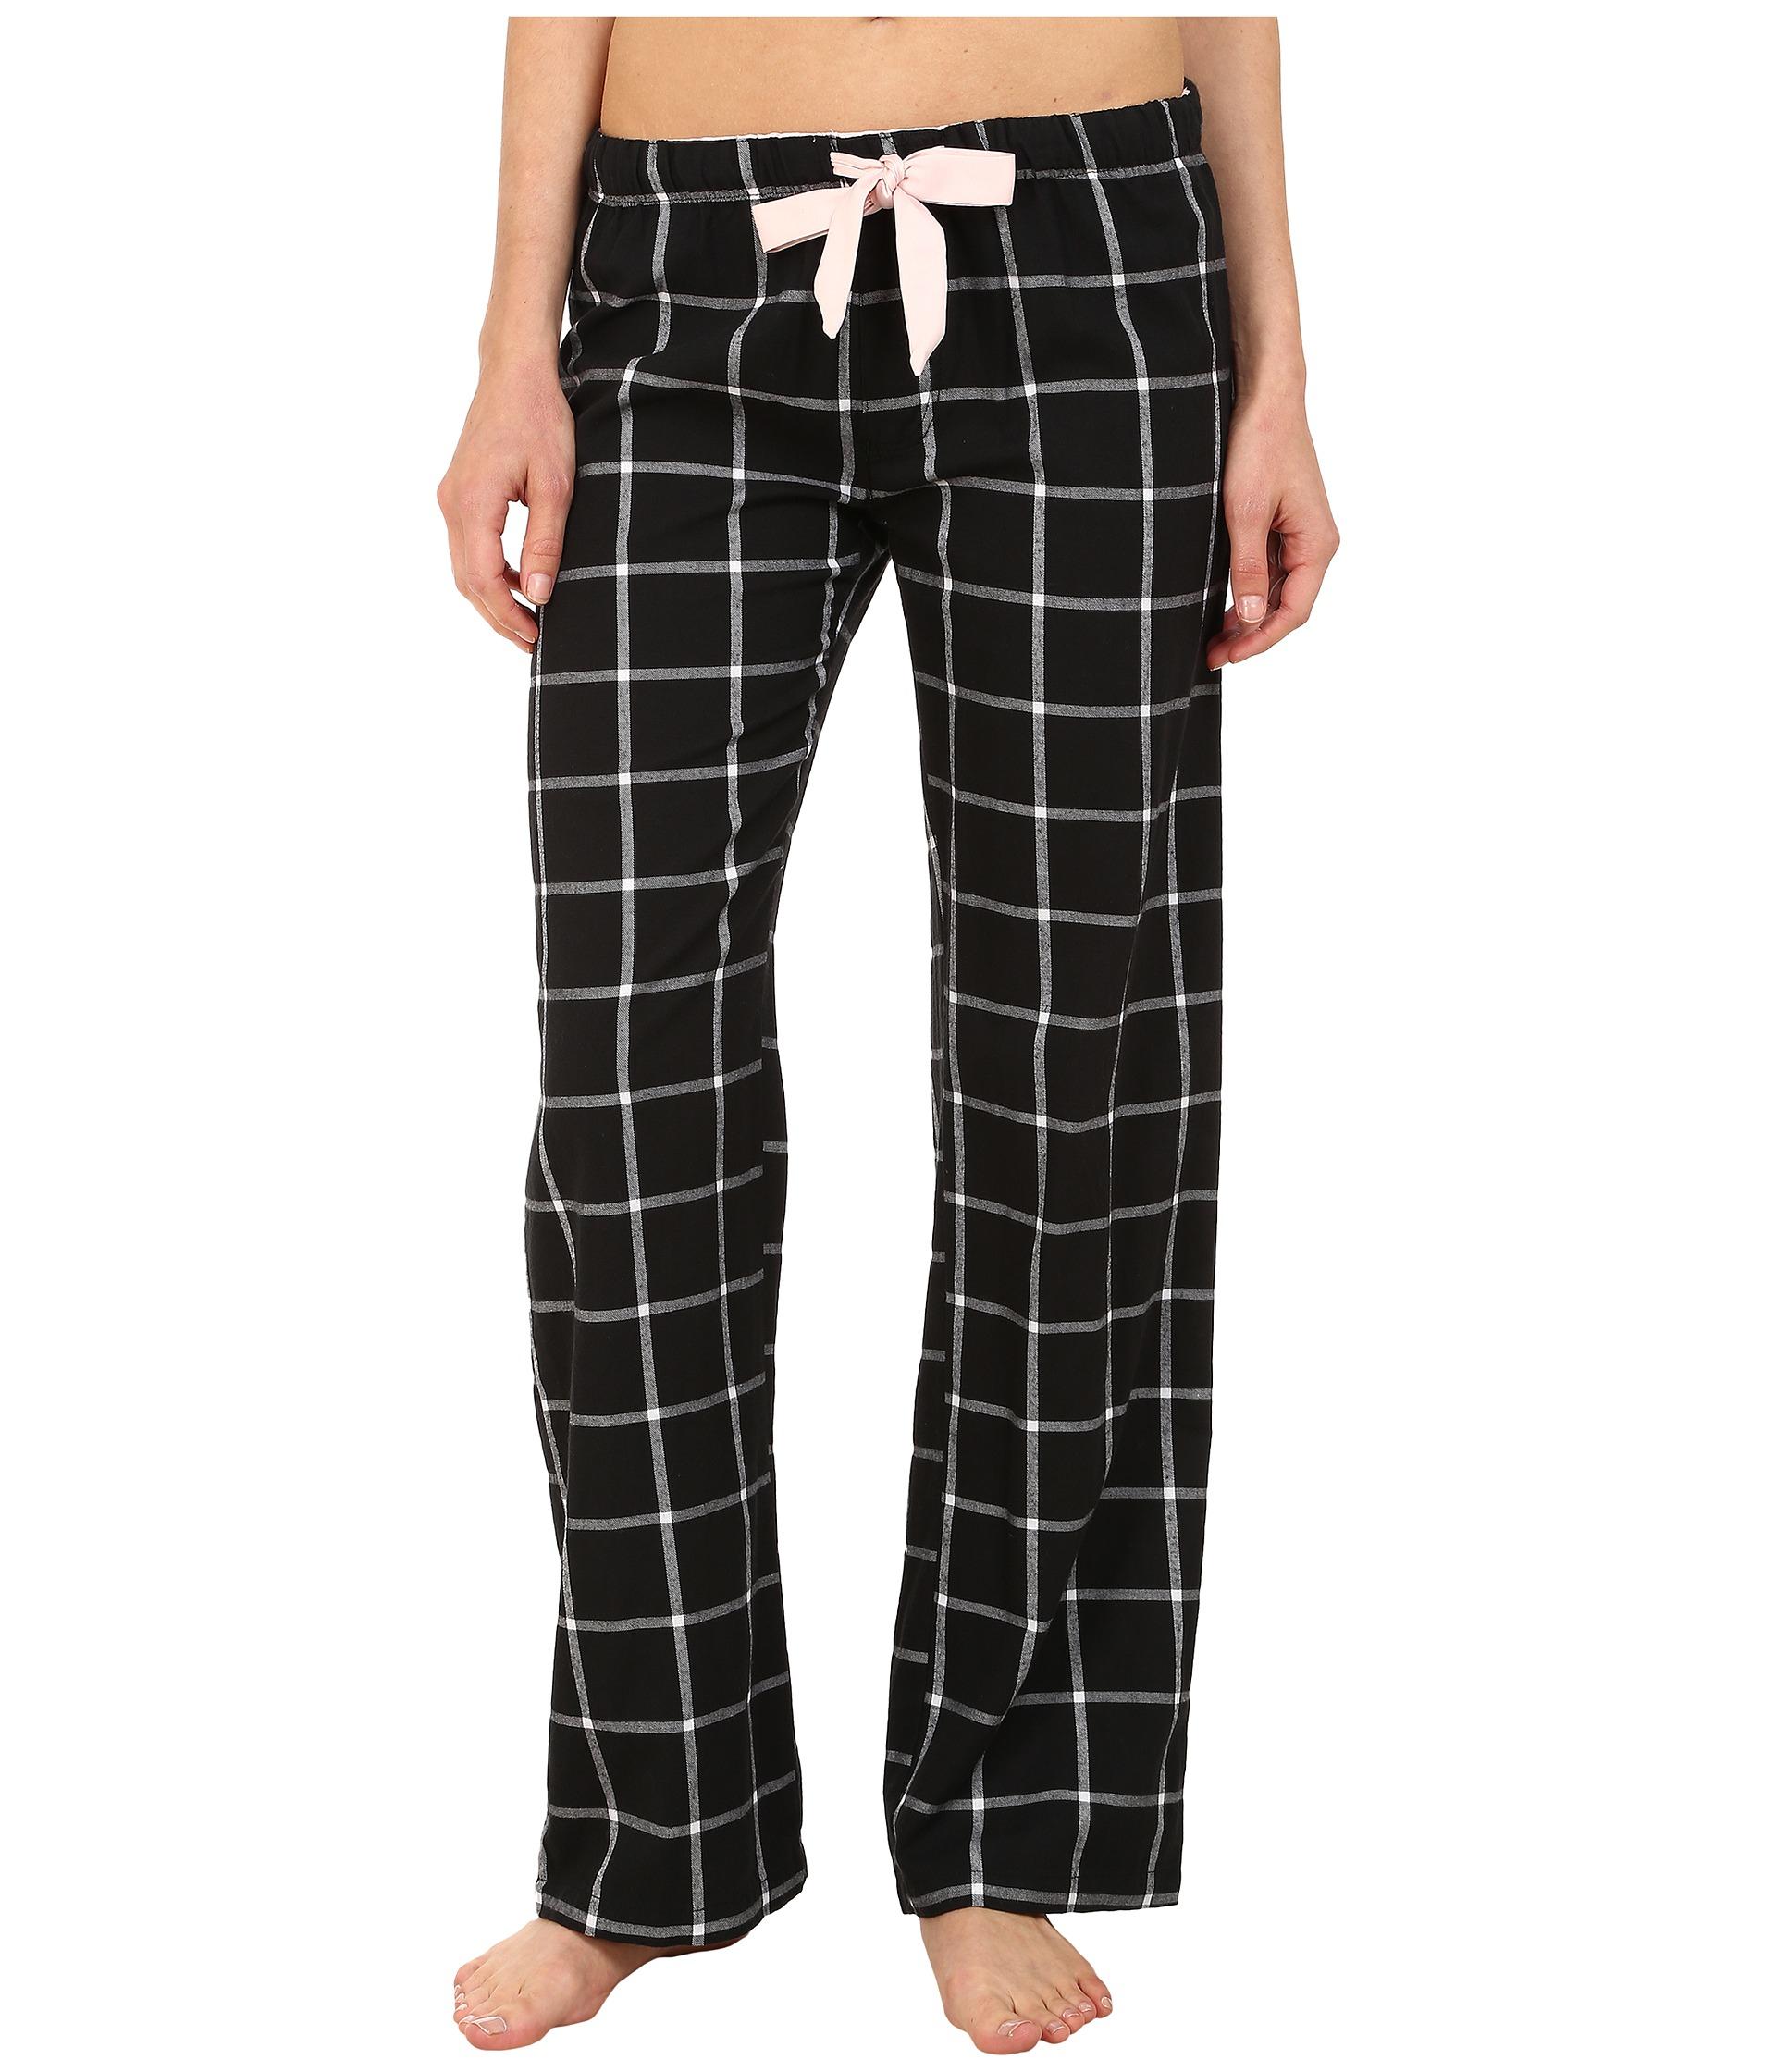 Pj salvage Black N Blush Plaid Pajama Pants in Black | Lyst